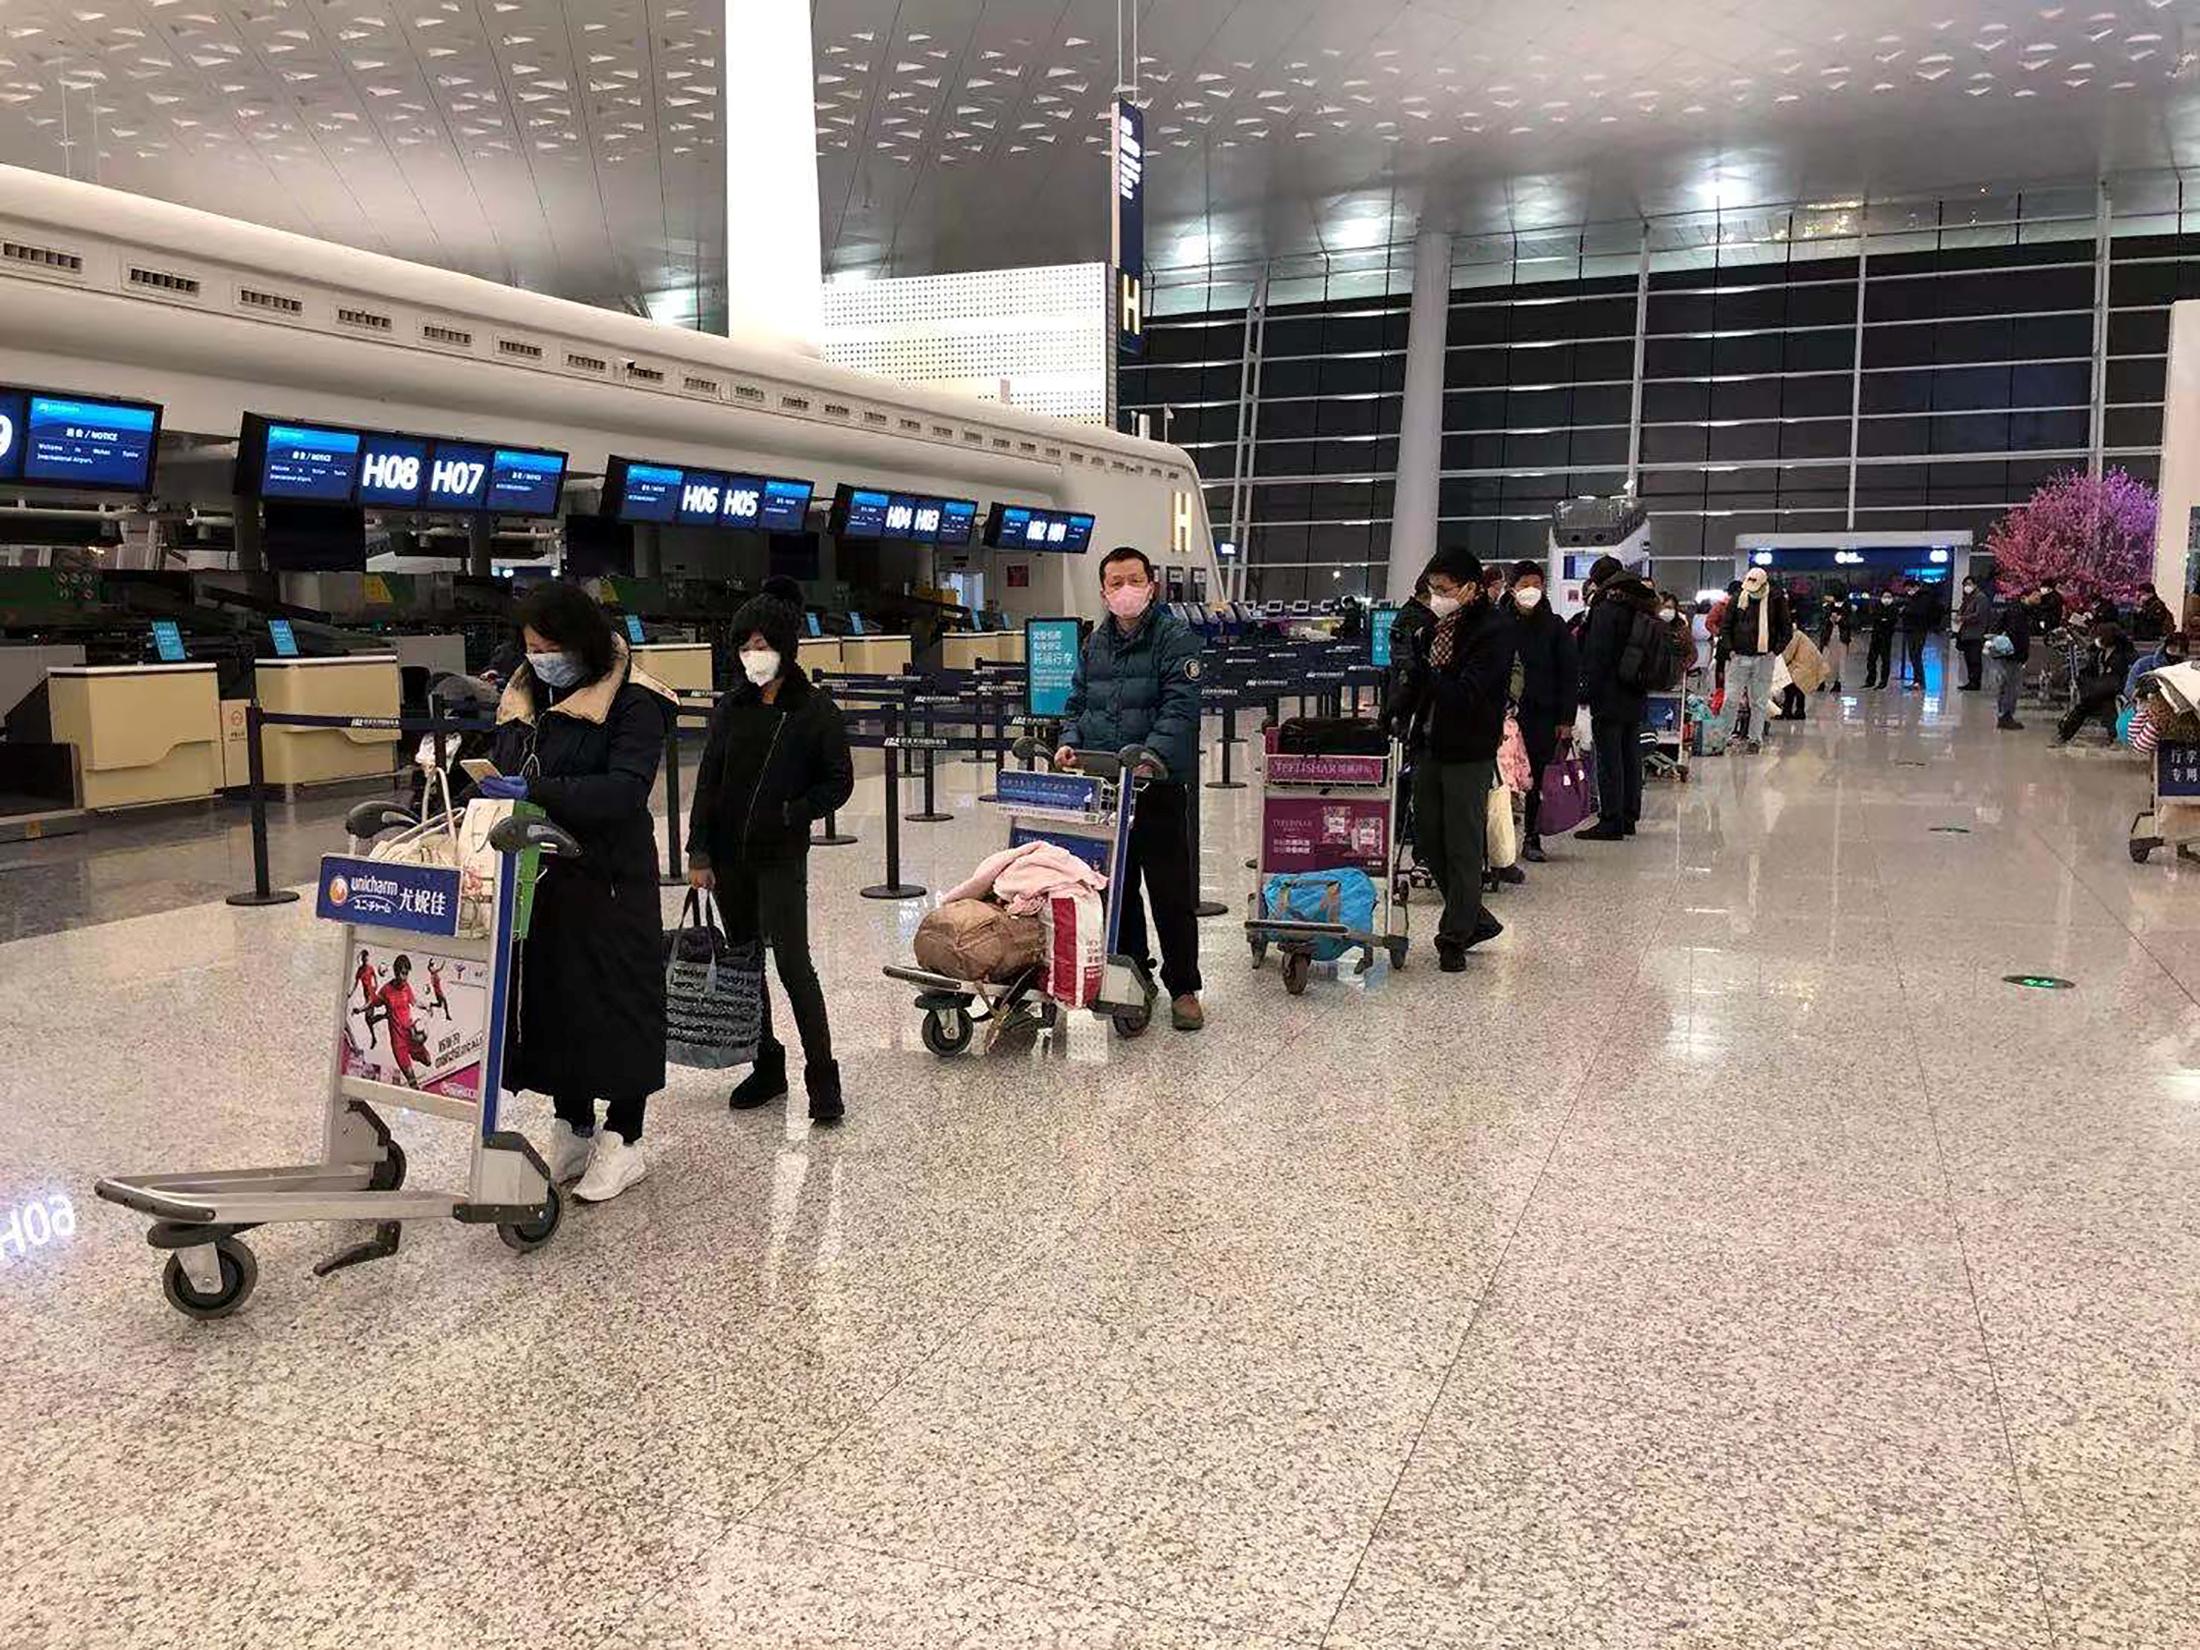 coronavirus-avion-cargo-passagers-rapatriement-ressortissants-americains-aeroport-wuhan-chine